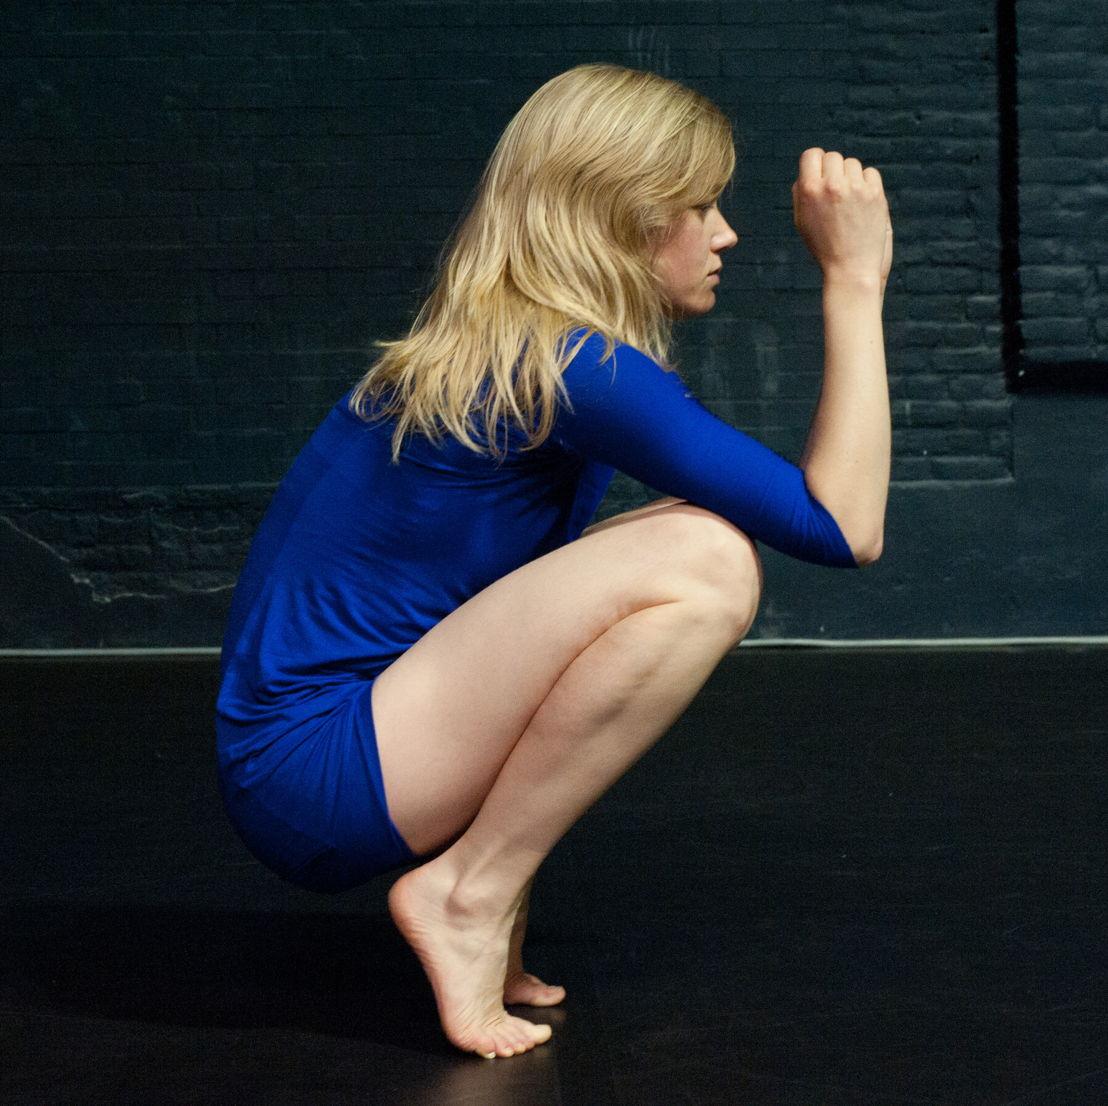 Charlotte Vanden Eynde - Shapeless + I'm Sorry ... - 21 > 22/01 - © Constance Neuenschwander